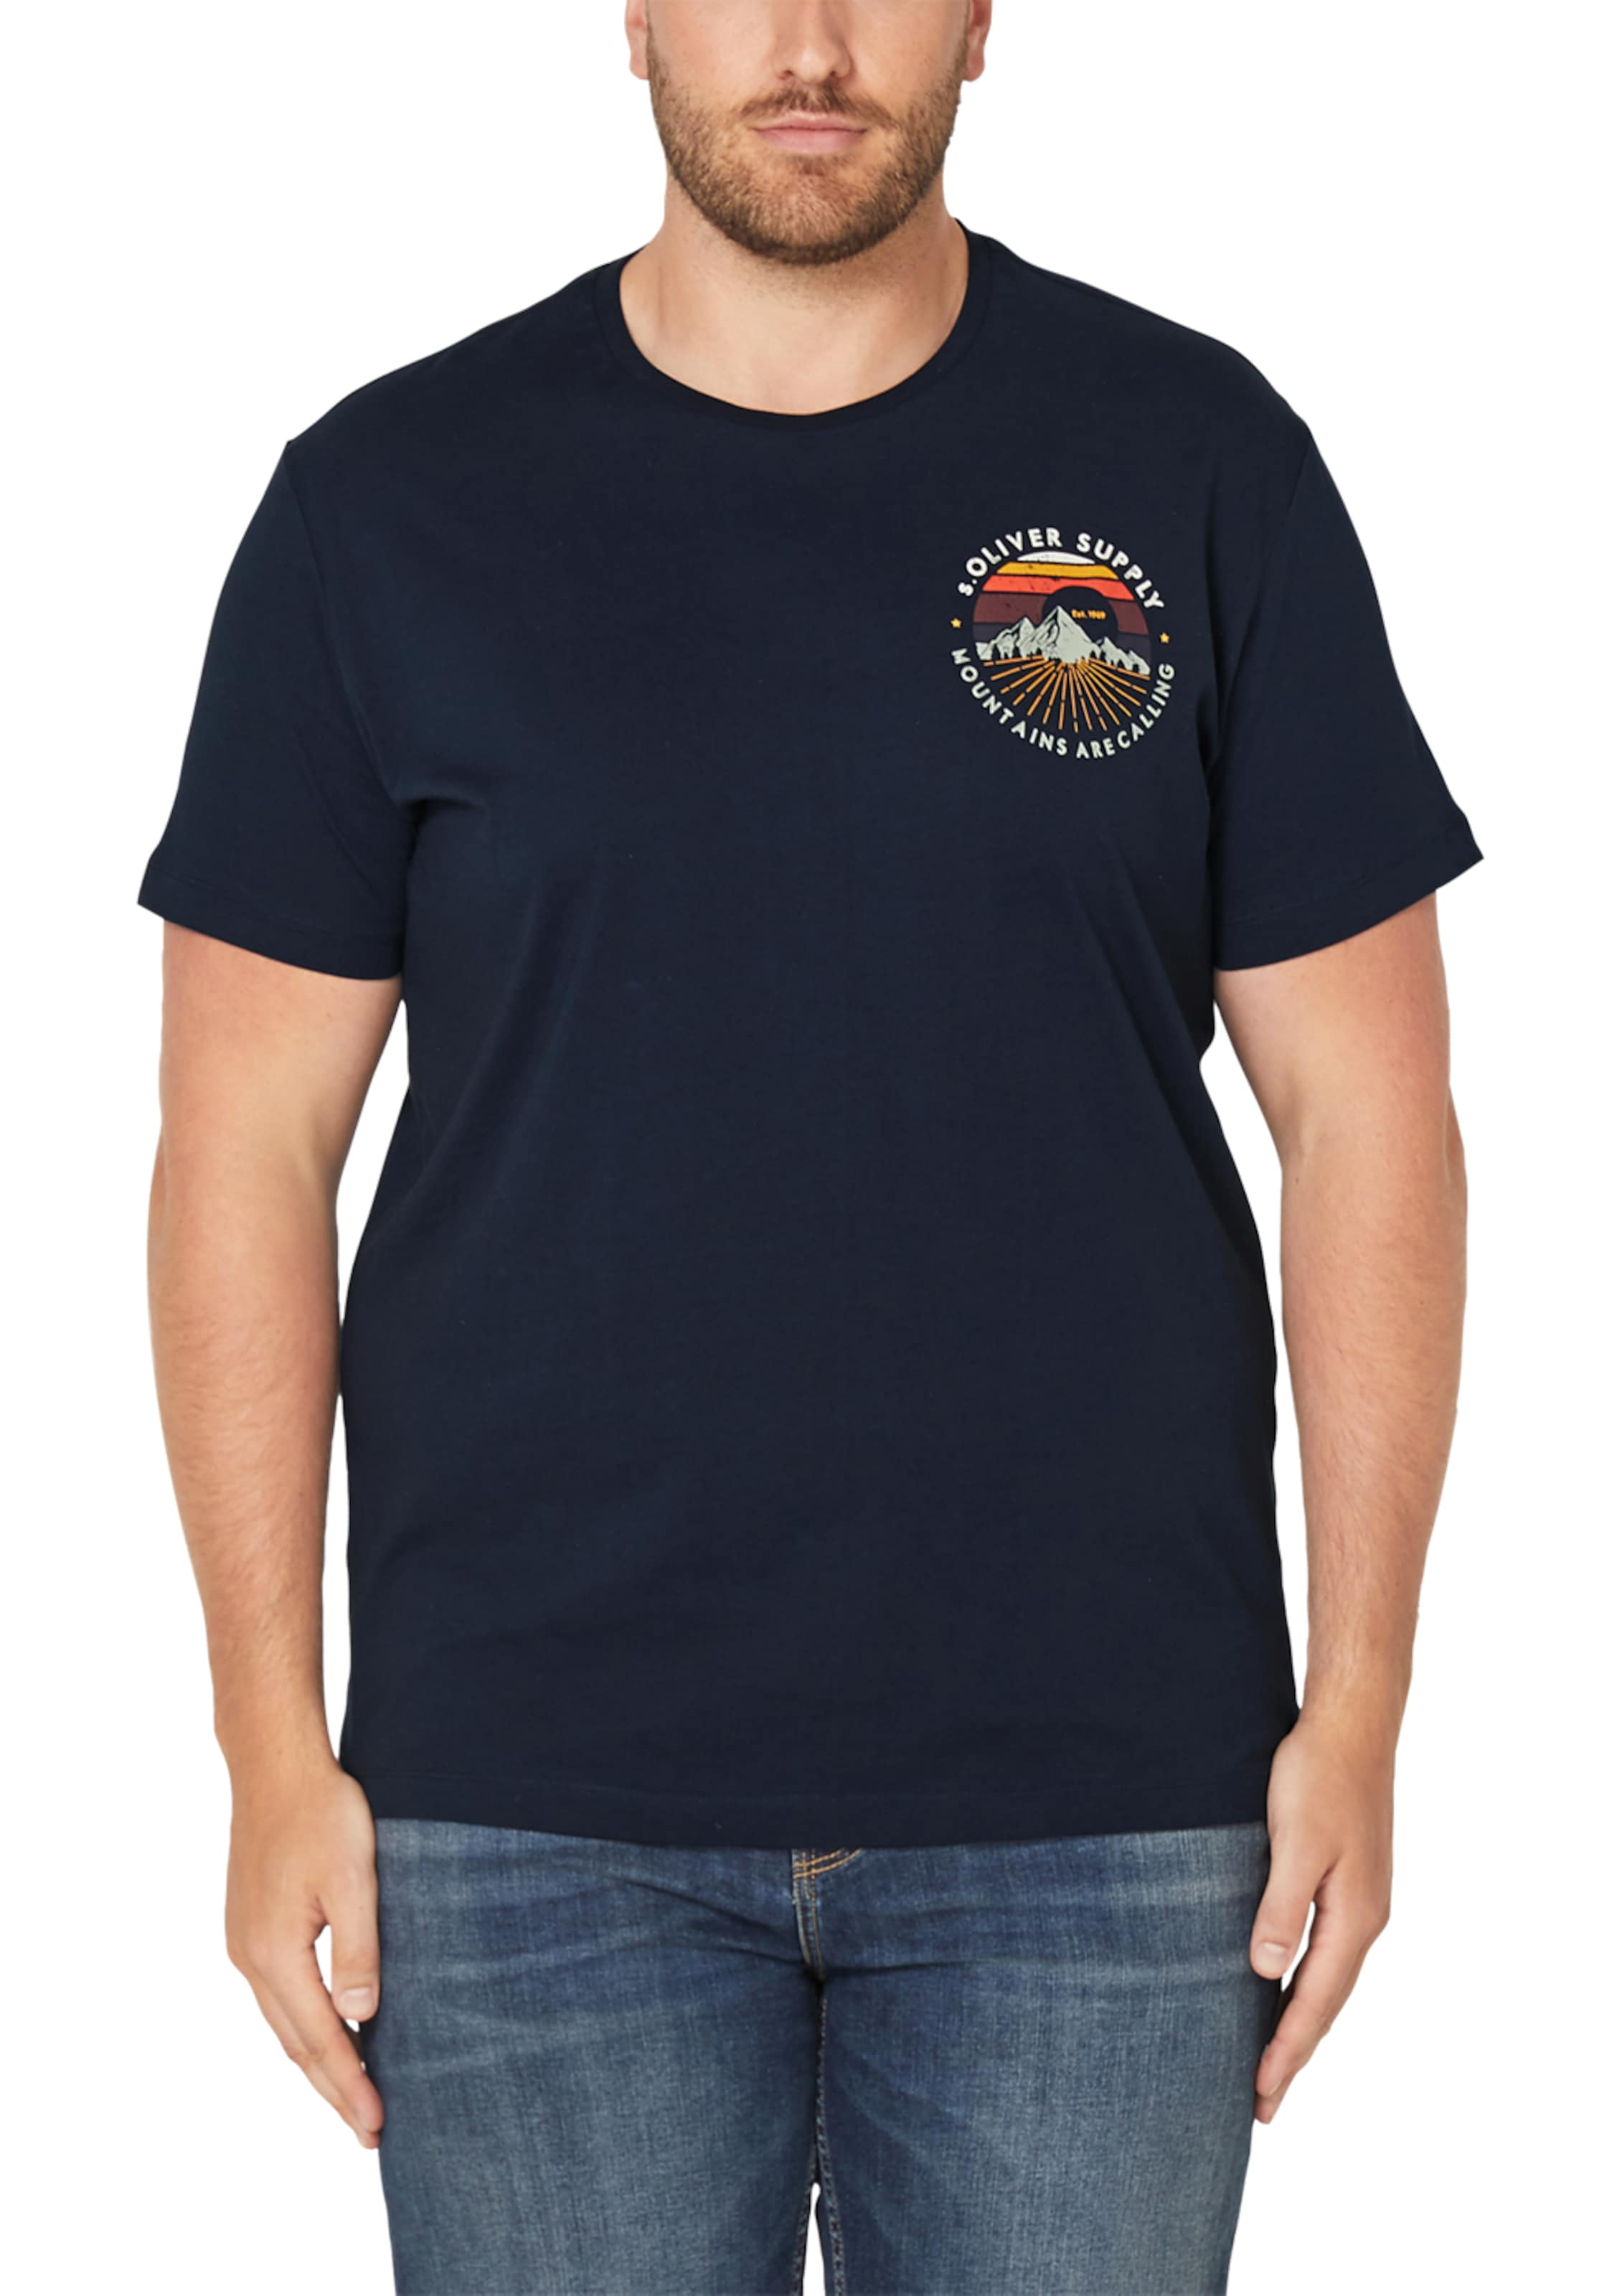 Nachtblau Jerseyshirt In S S oliver dQWErxoBCe